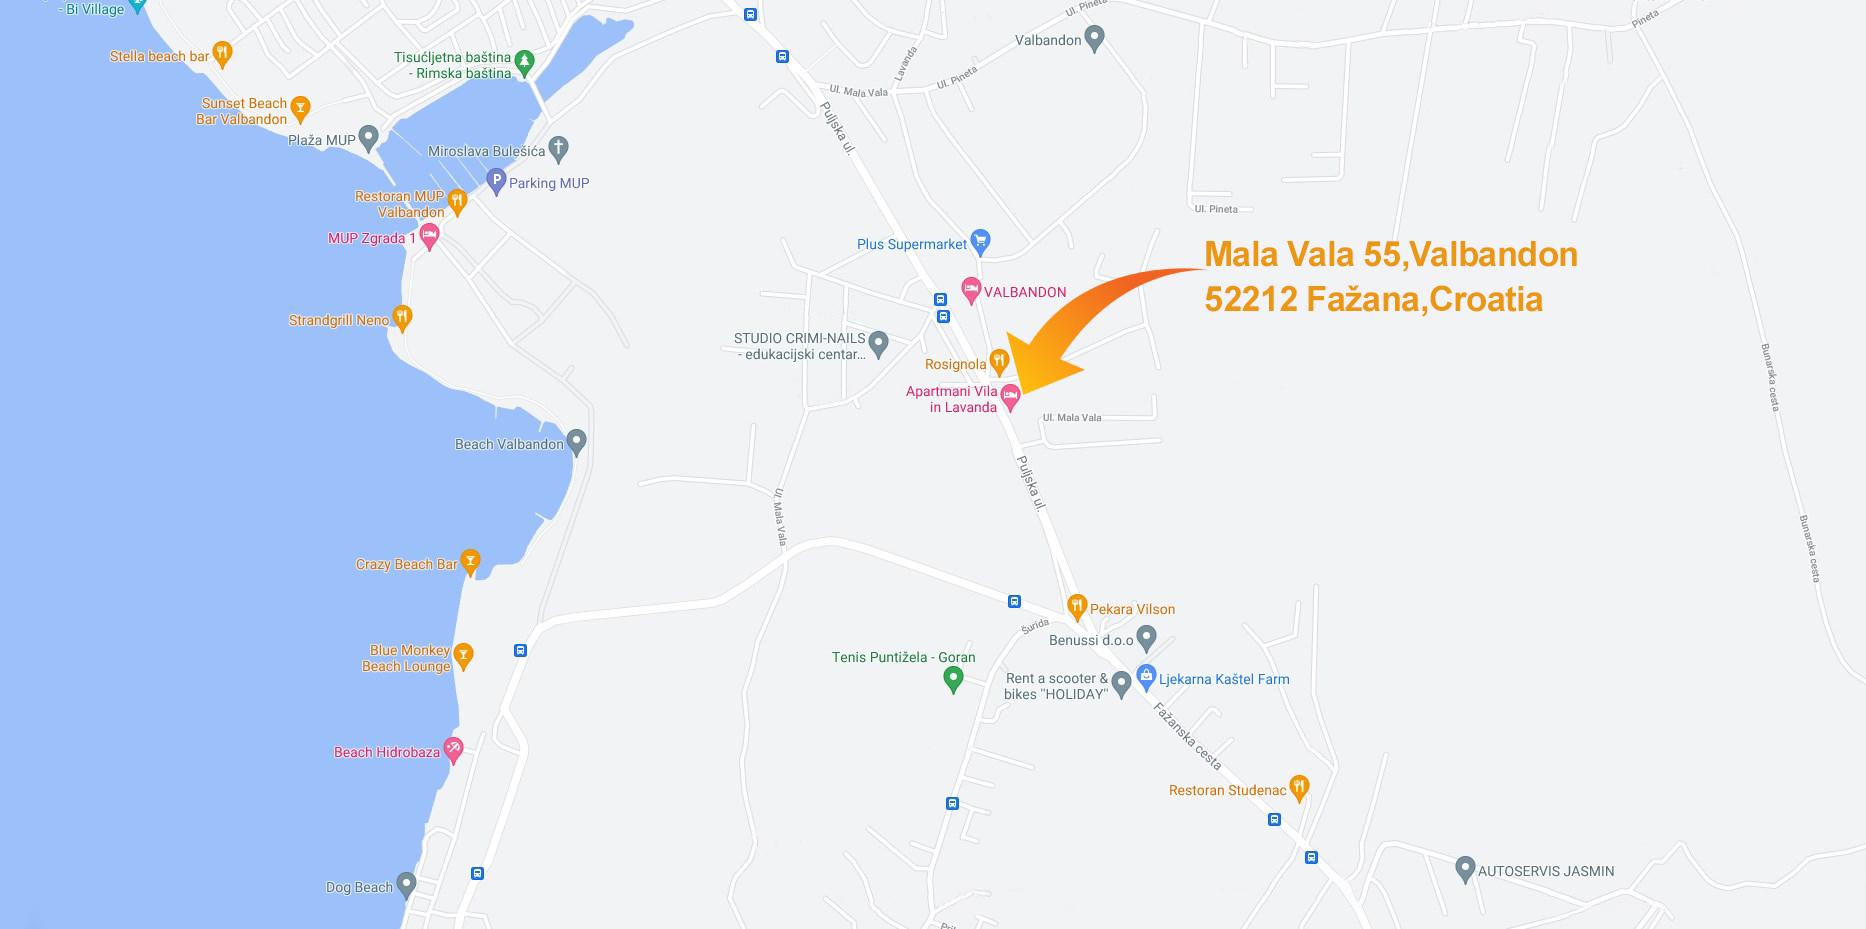 inlavanda-map-00001